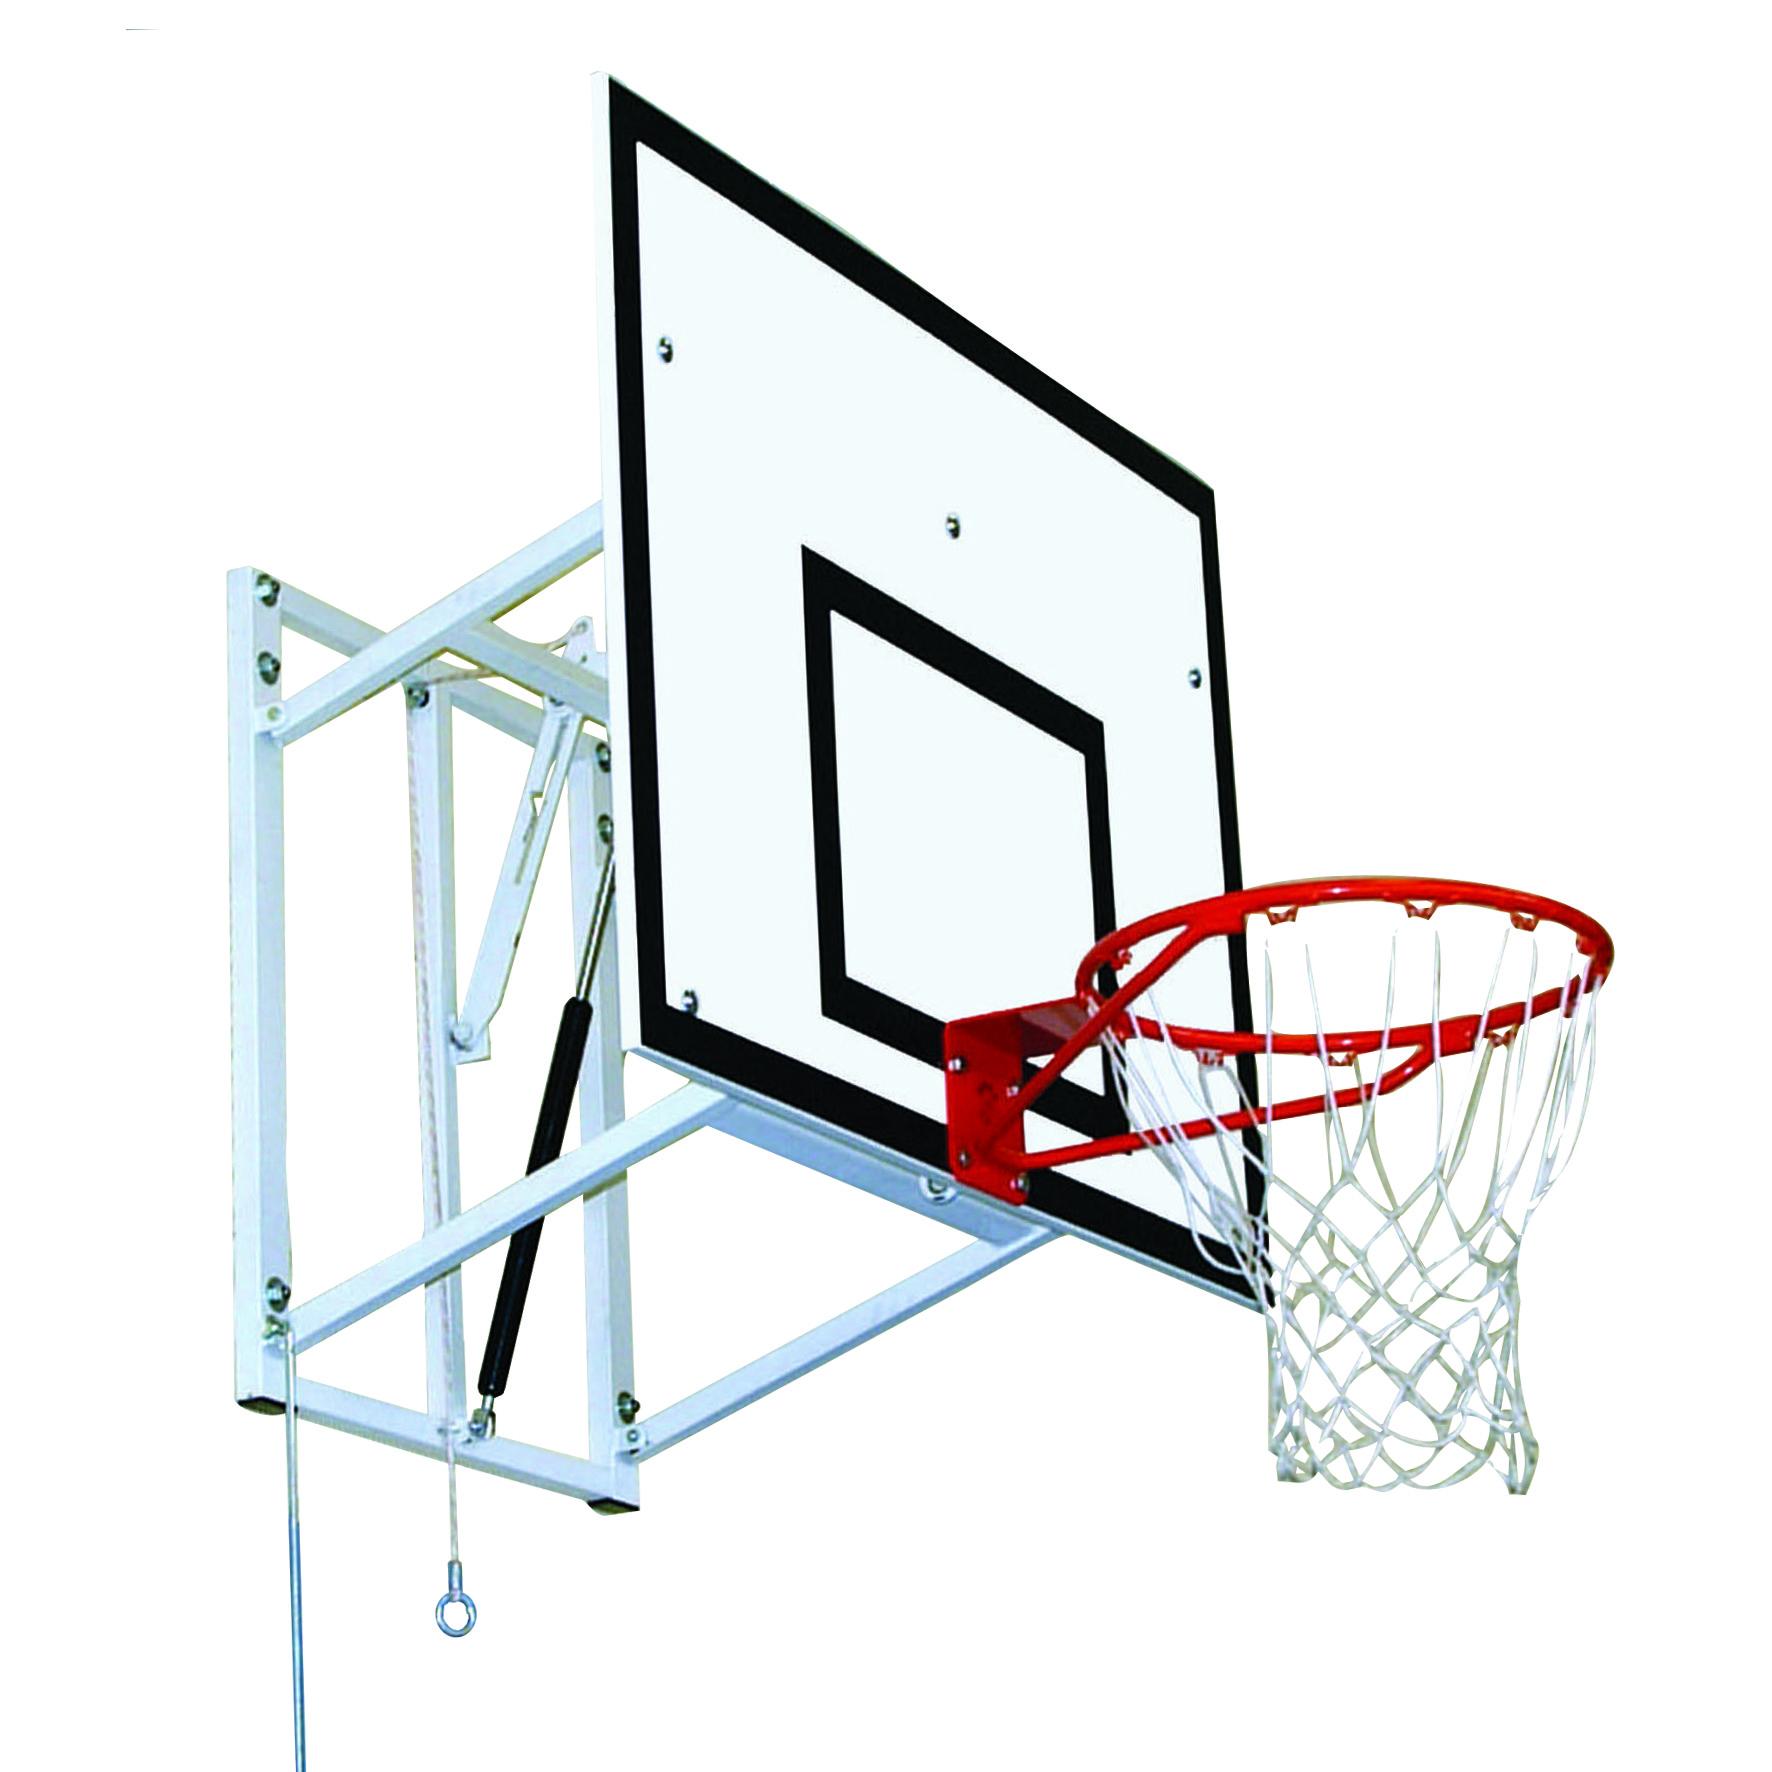 Adjustable Height Practice Basketball Goal by Unisport